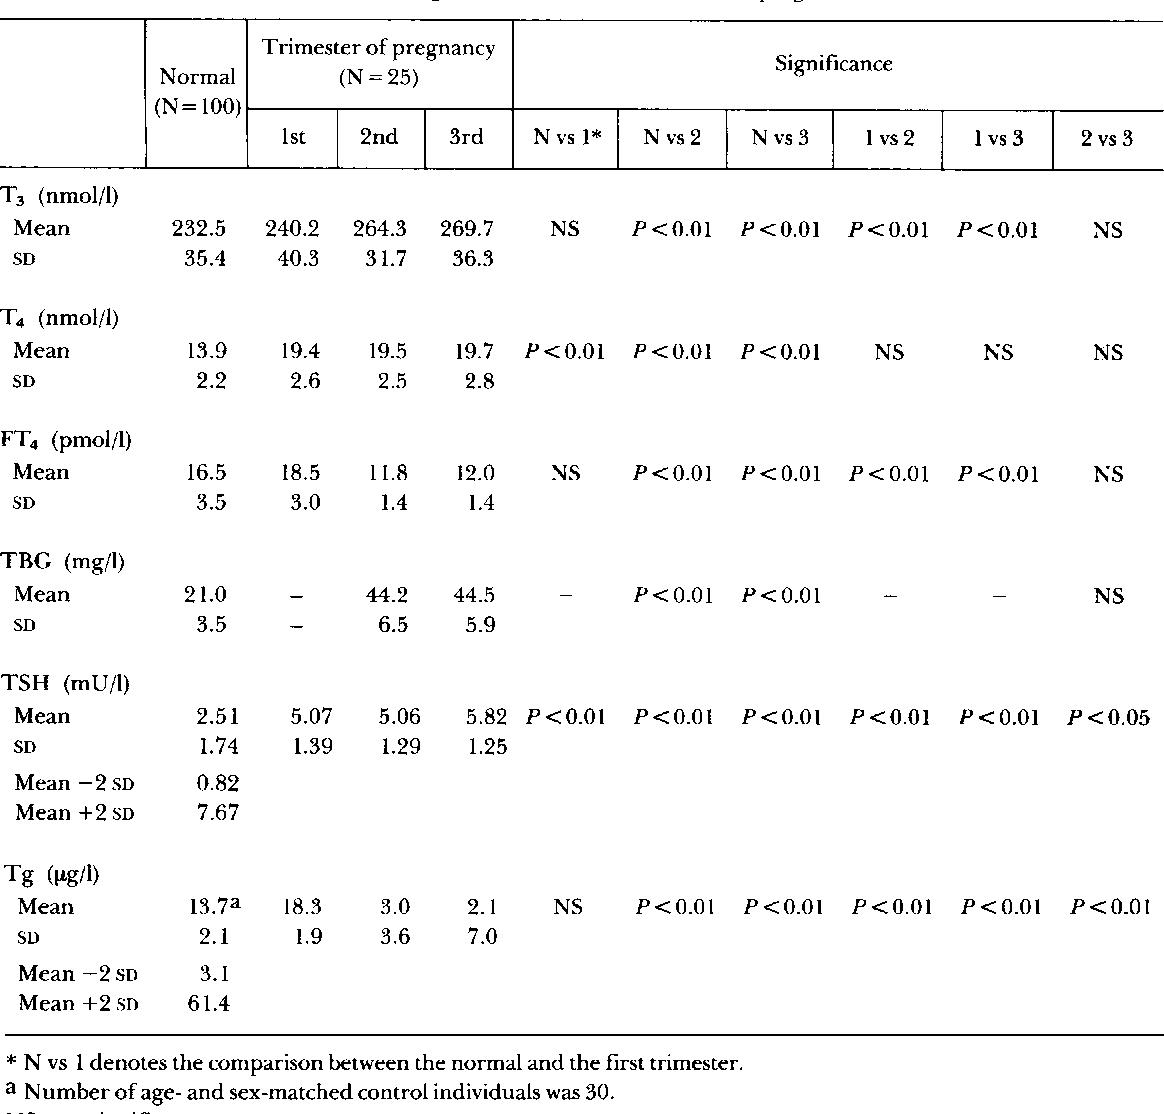 Pdf Decreased Serum Thyroglobulin Levels In The Late Stage Of